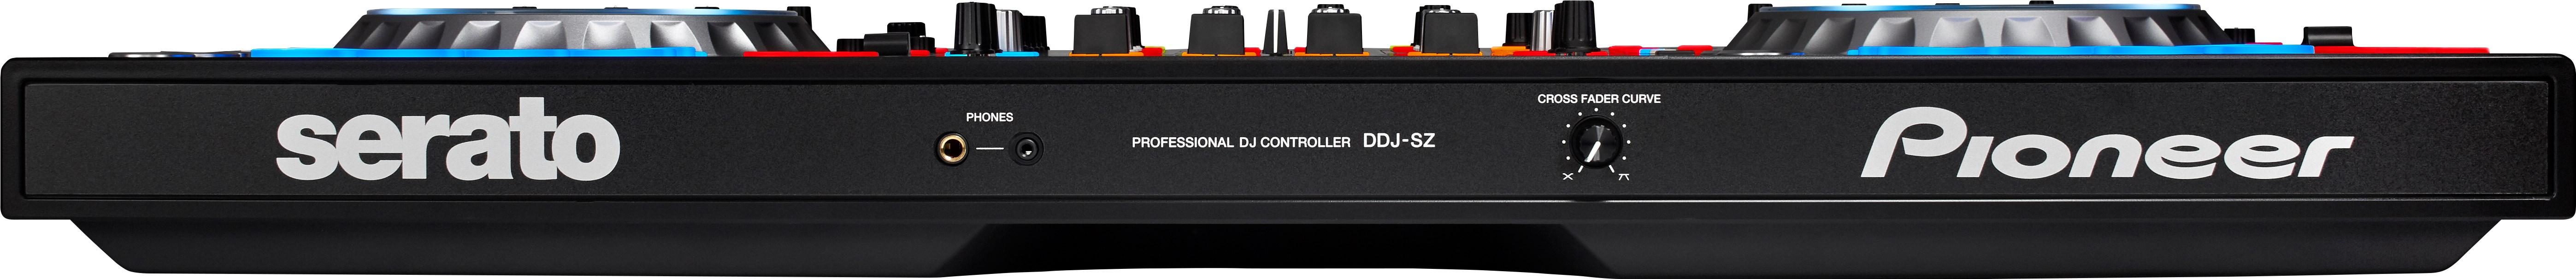 DDJ-SZ